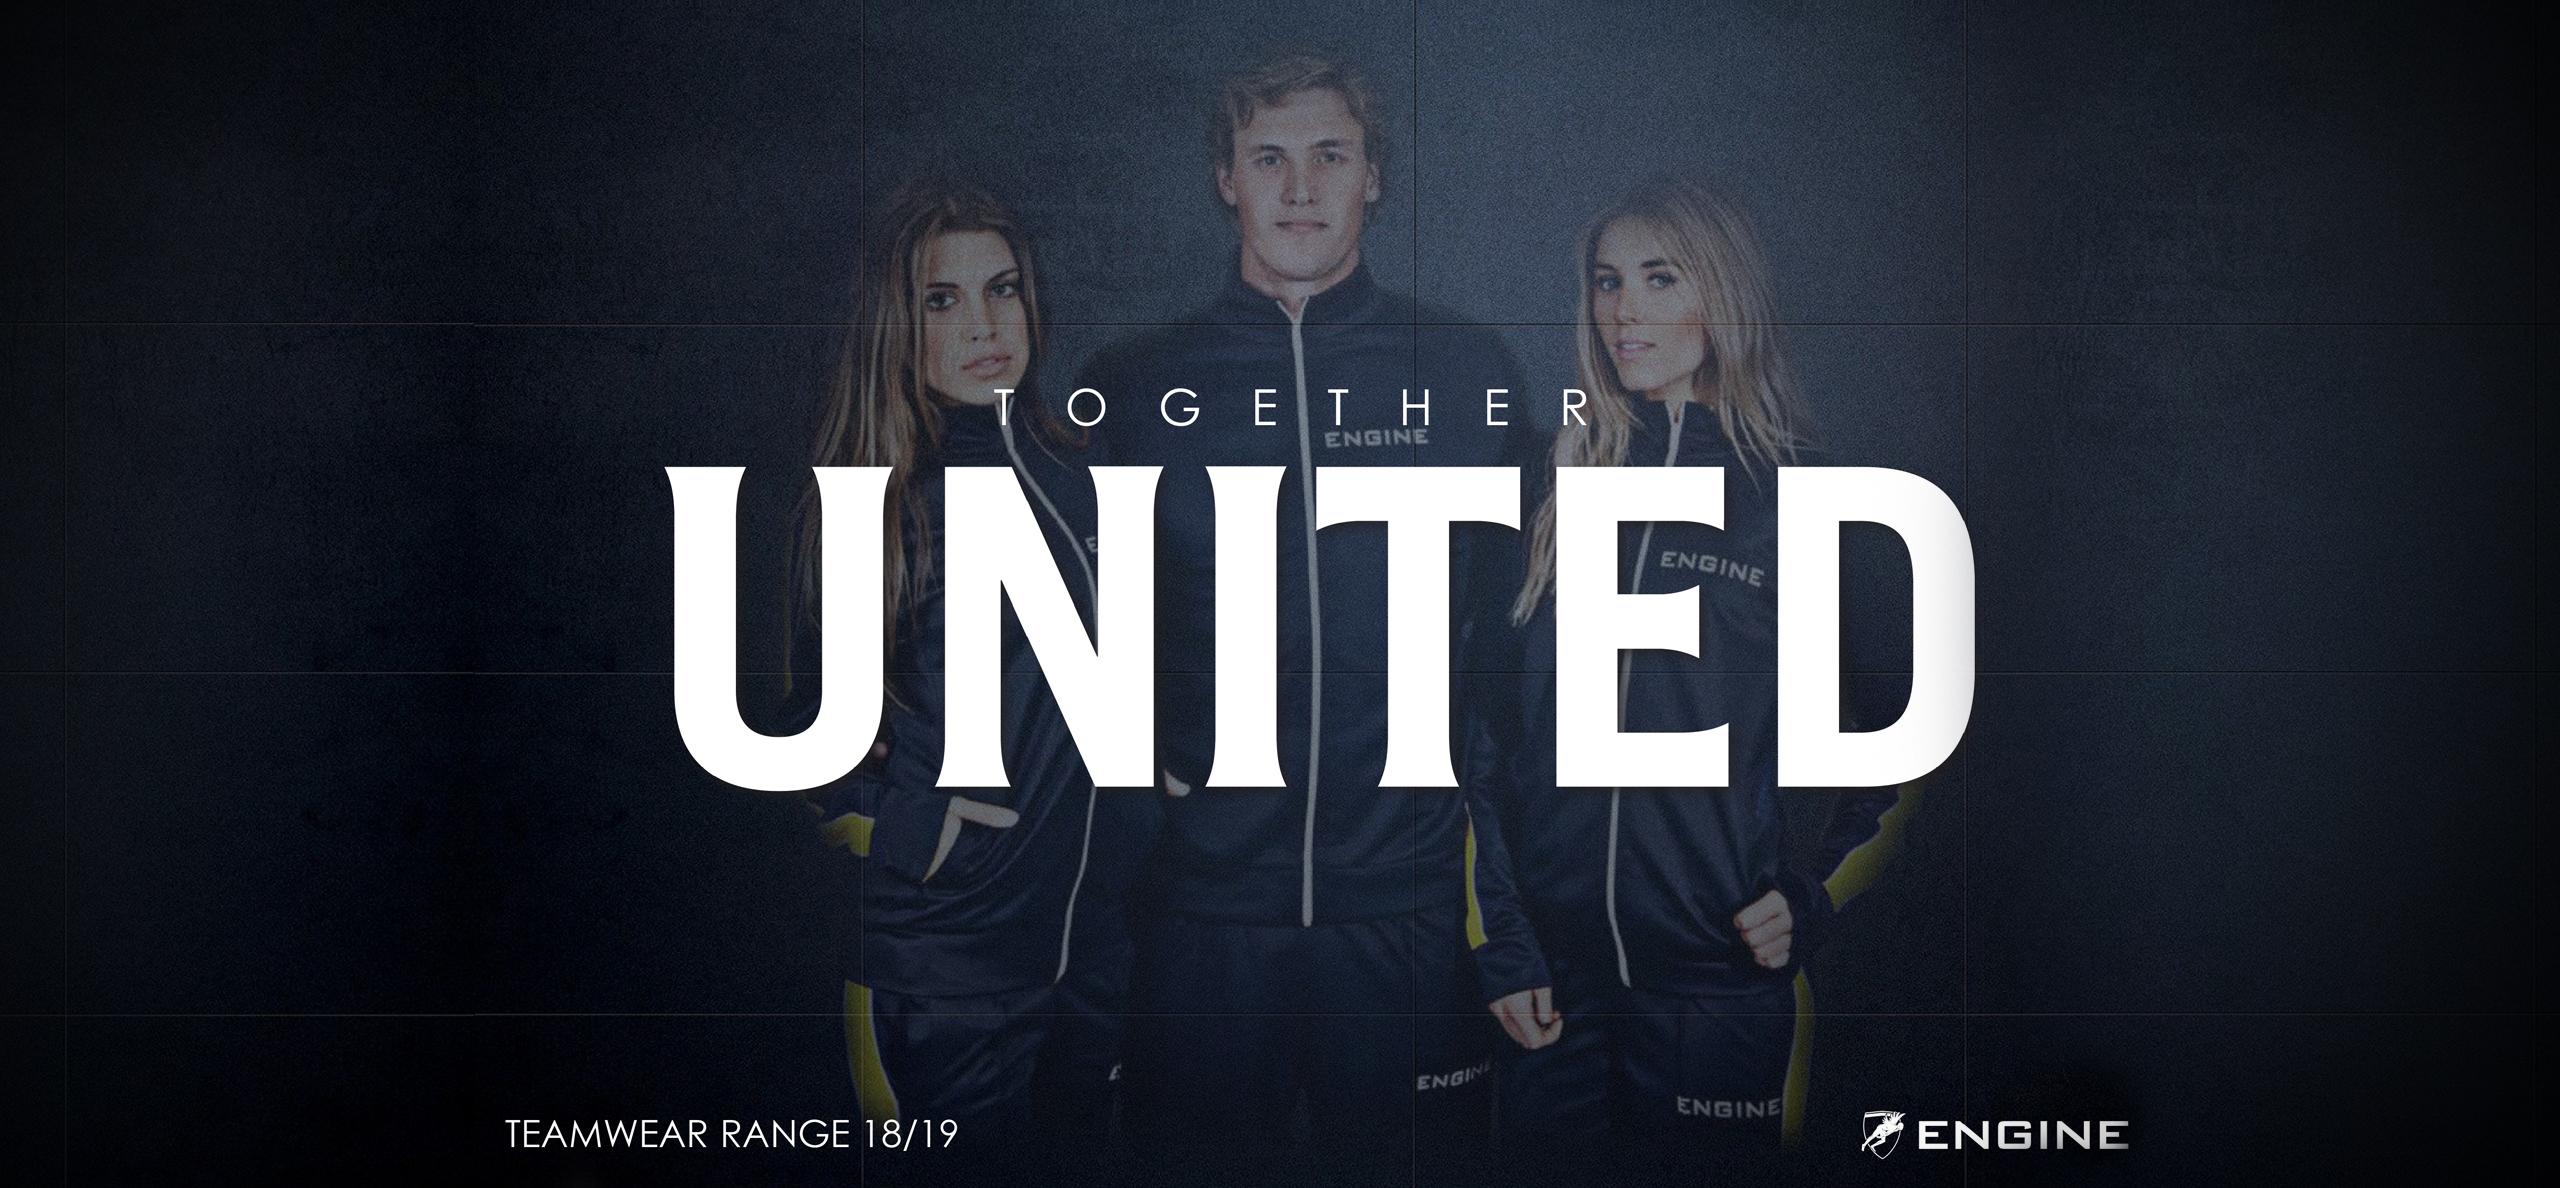 united-teamwear-banner-image.jpg